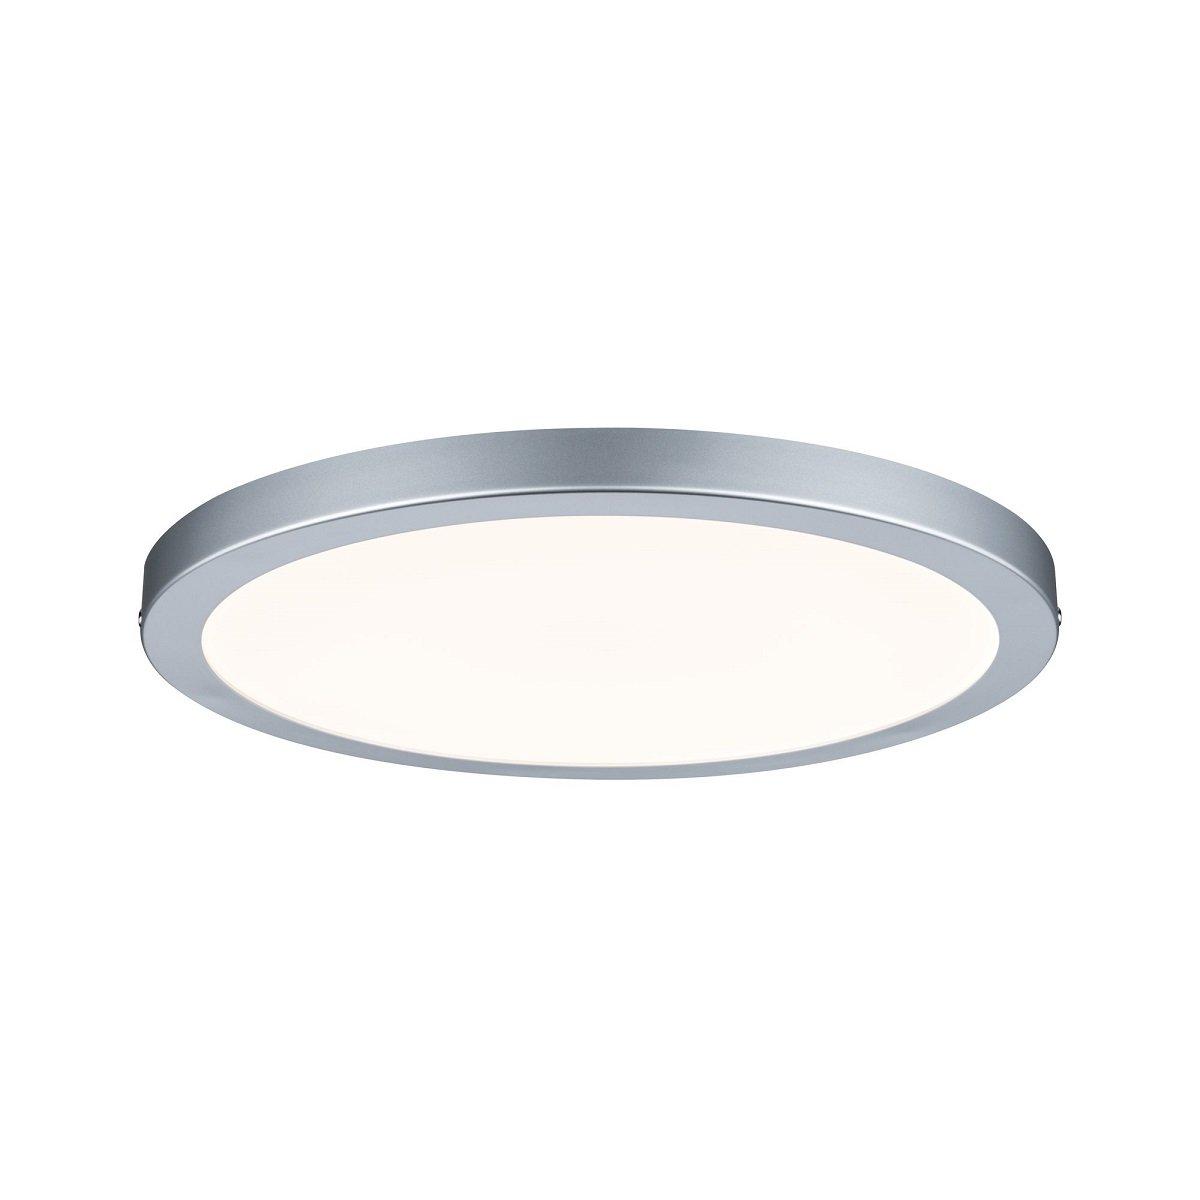 Led Lampen Panel : Paulmann no led panel atria w chrom matt dimmbar eur